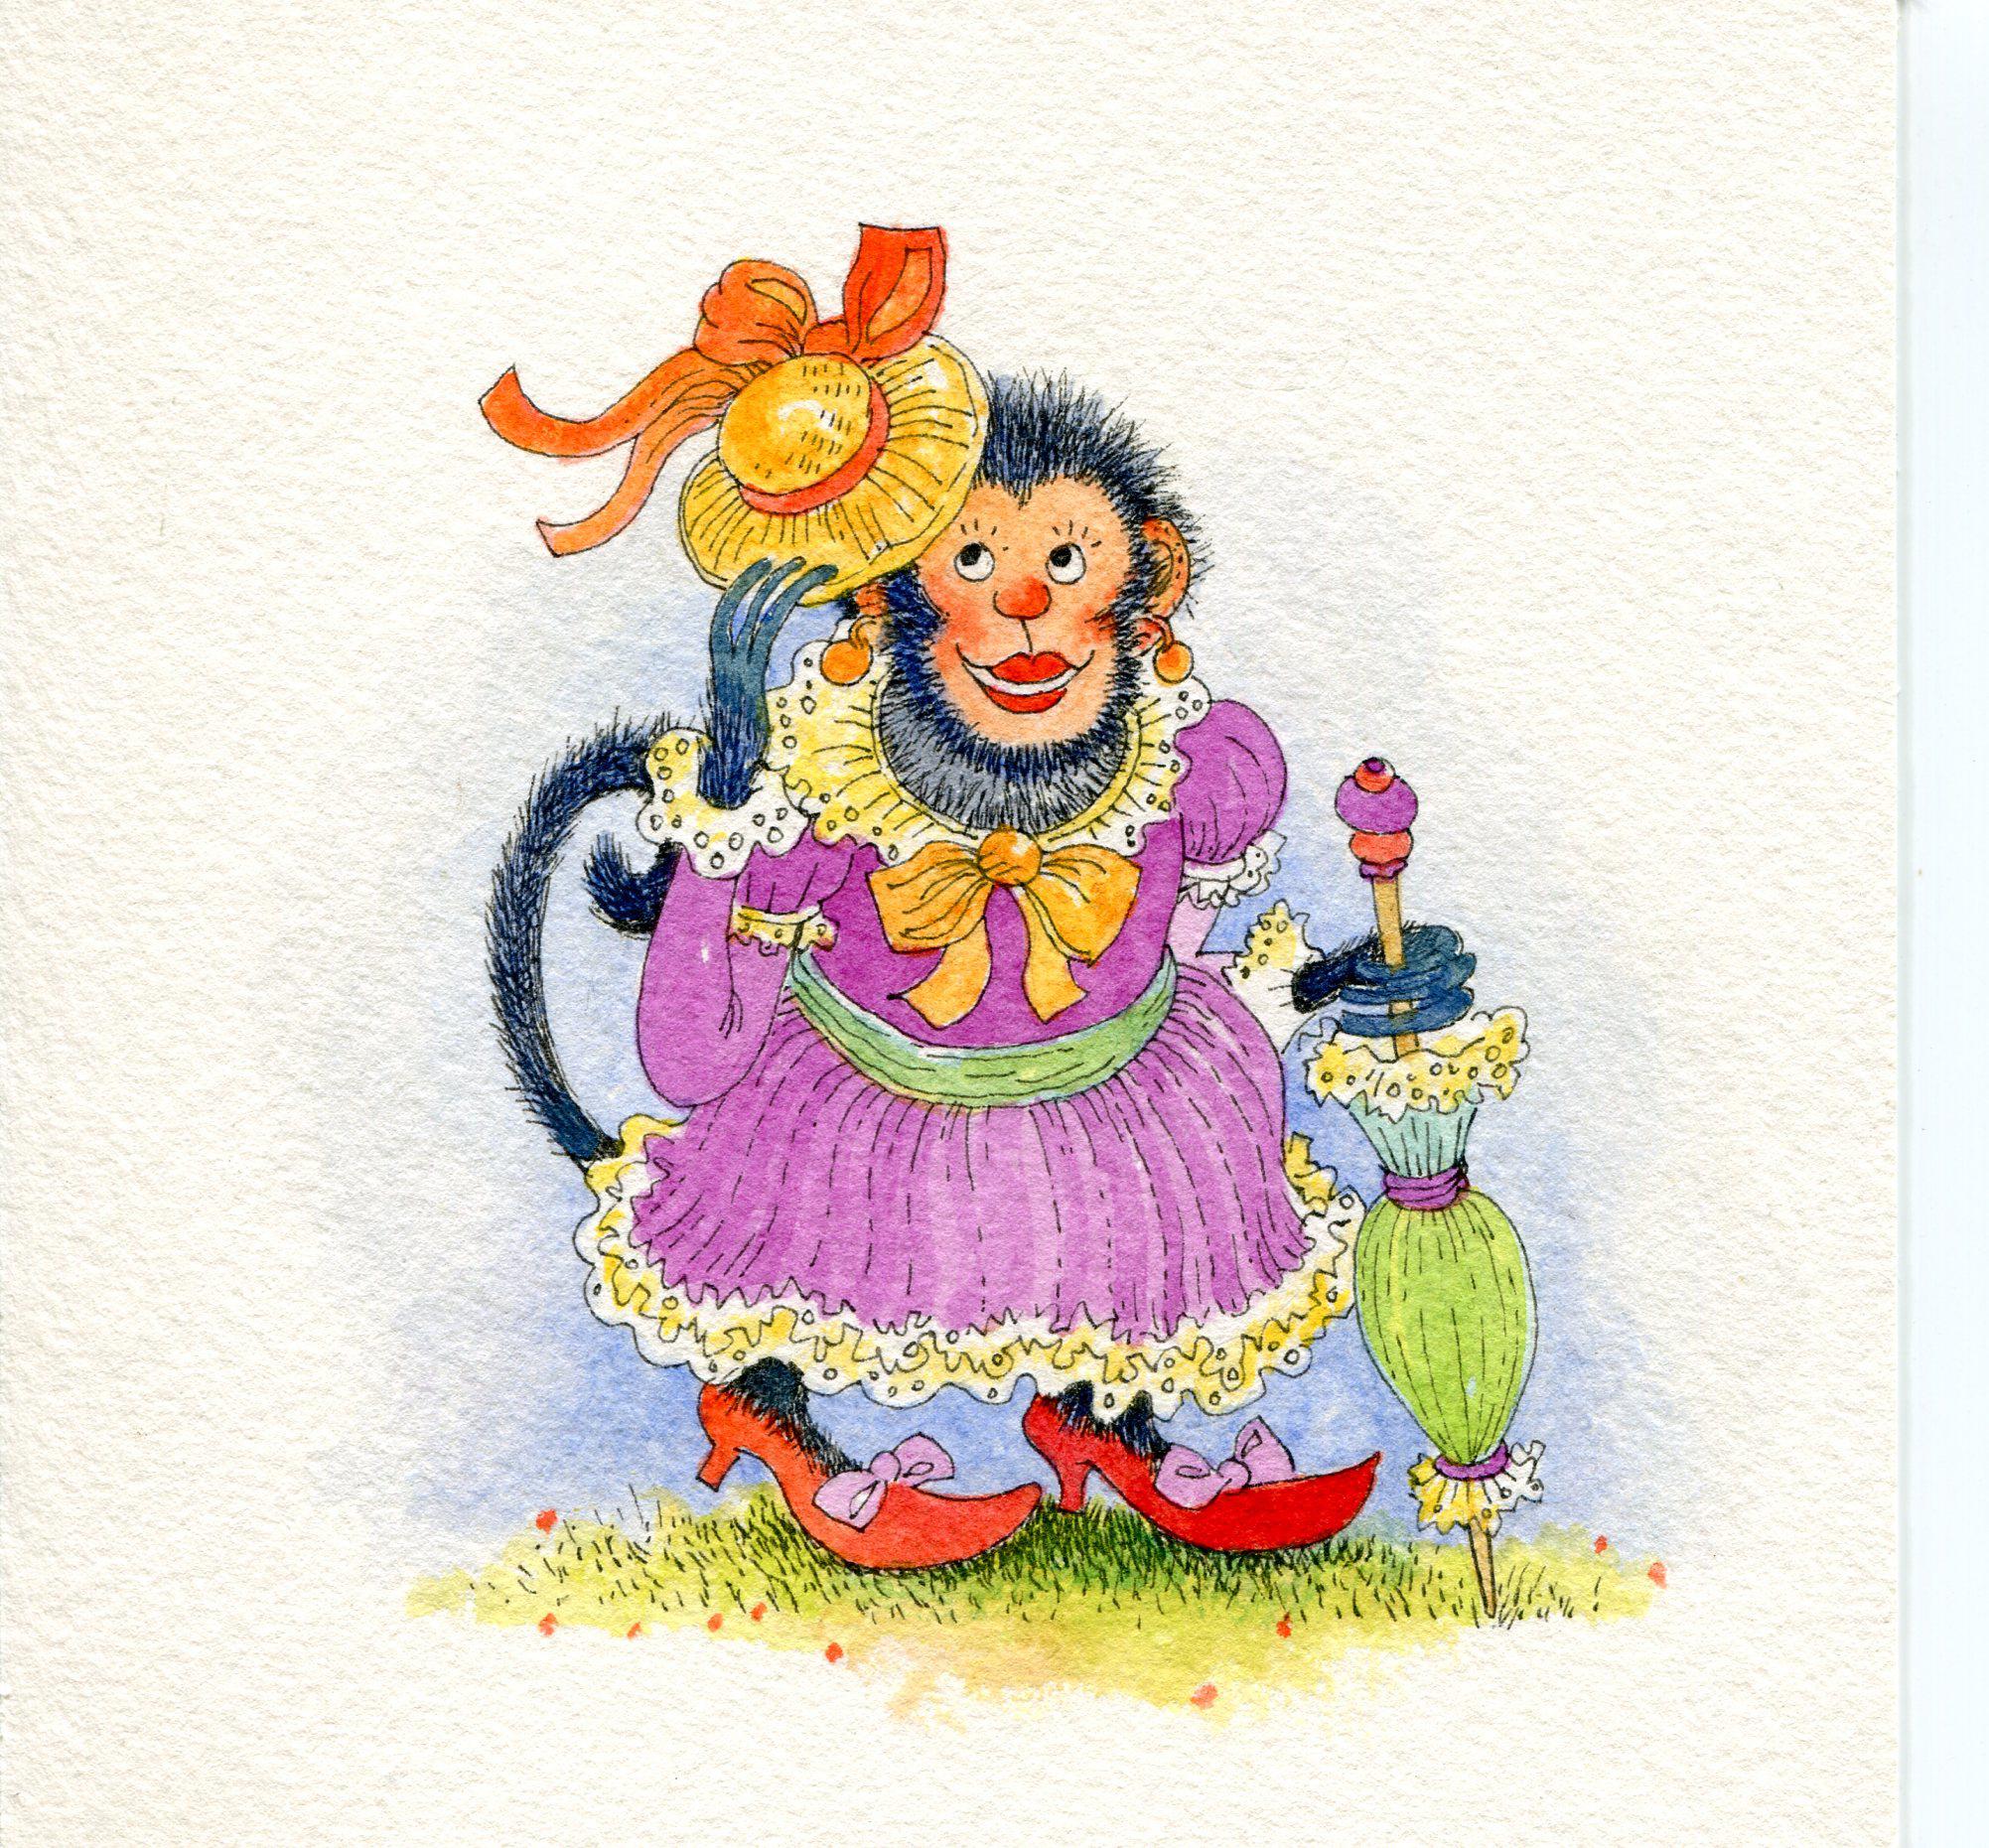 Ilustración de María Cristina Brusca